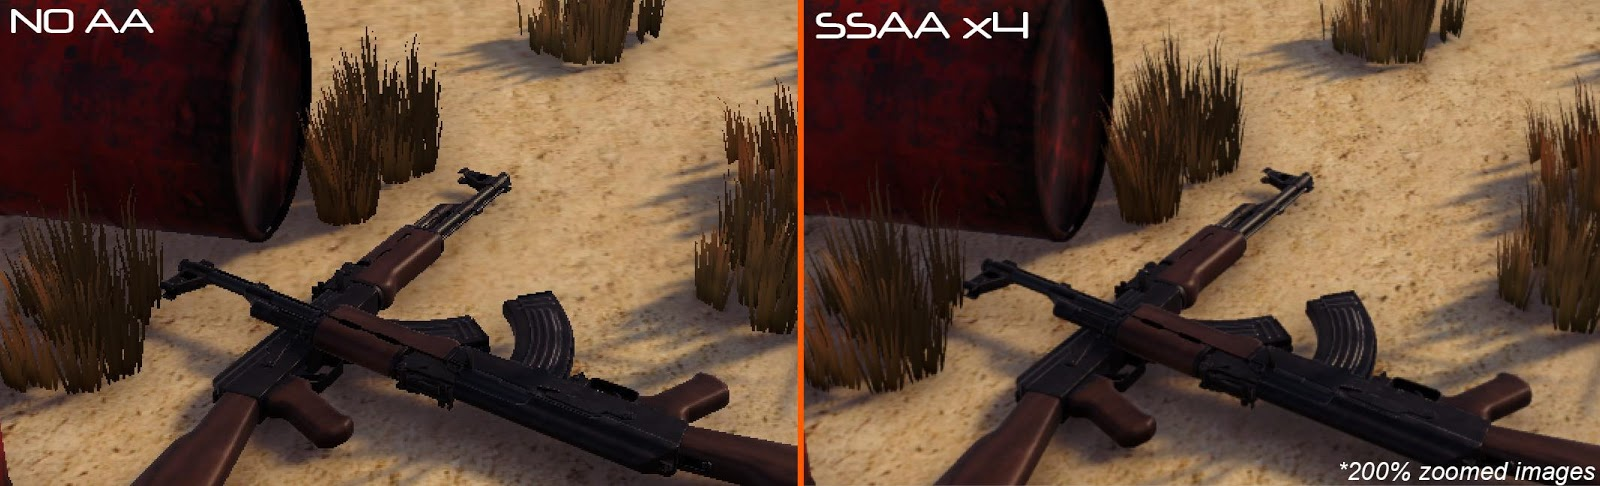 SSAA example